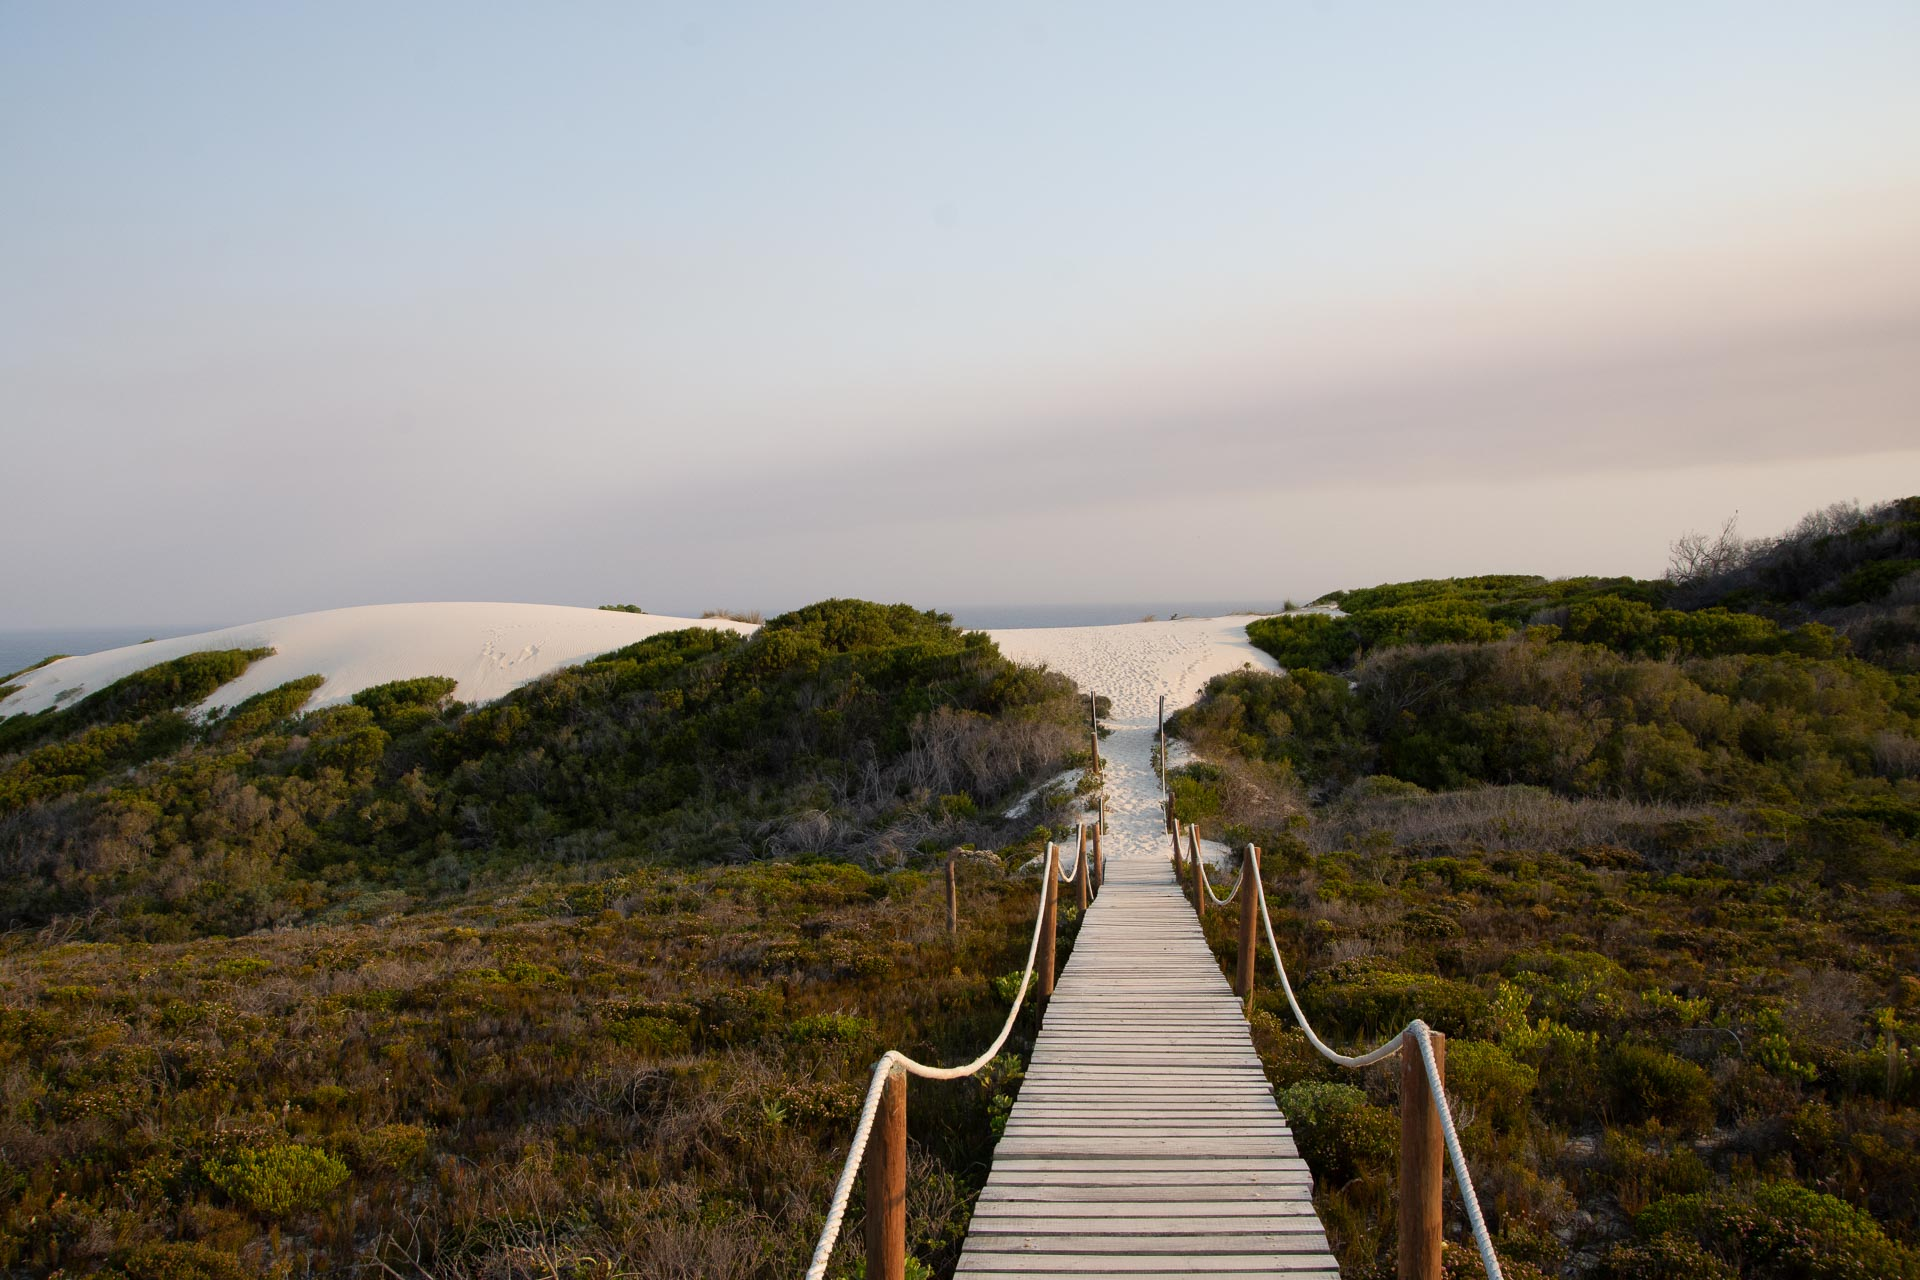 De-Hoop-Nature-Reserve-Suedafrika-Globetrotter-Select-1